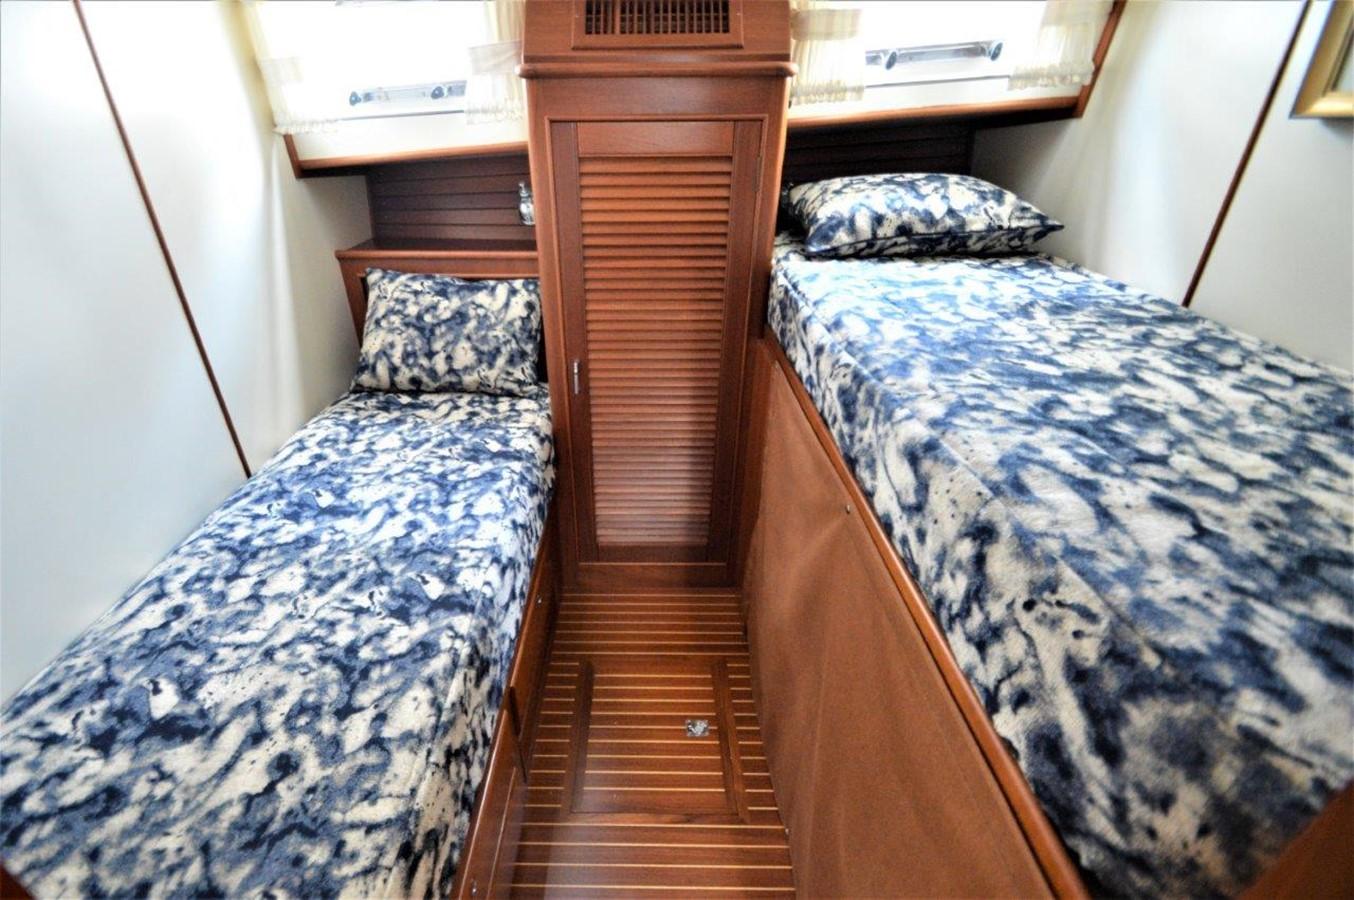 2000 GRAND BANKS 49 Eastbay HX Cruiser 2669767